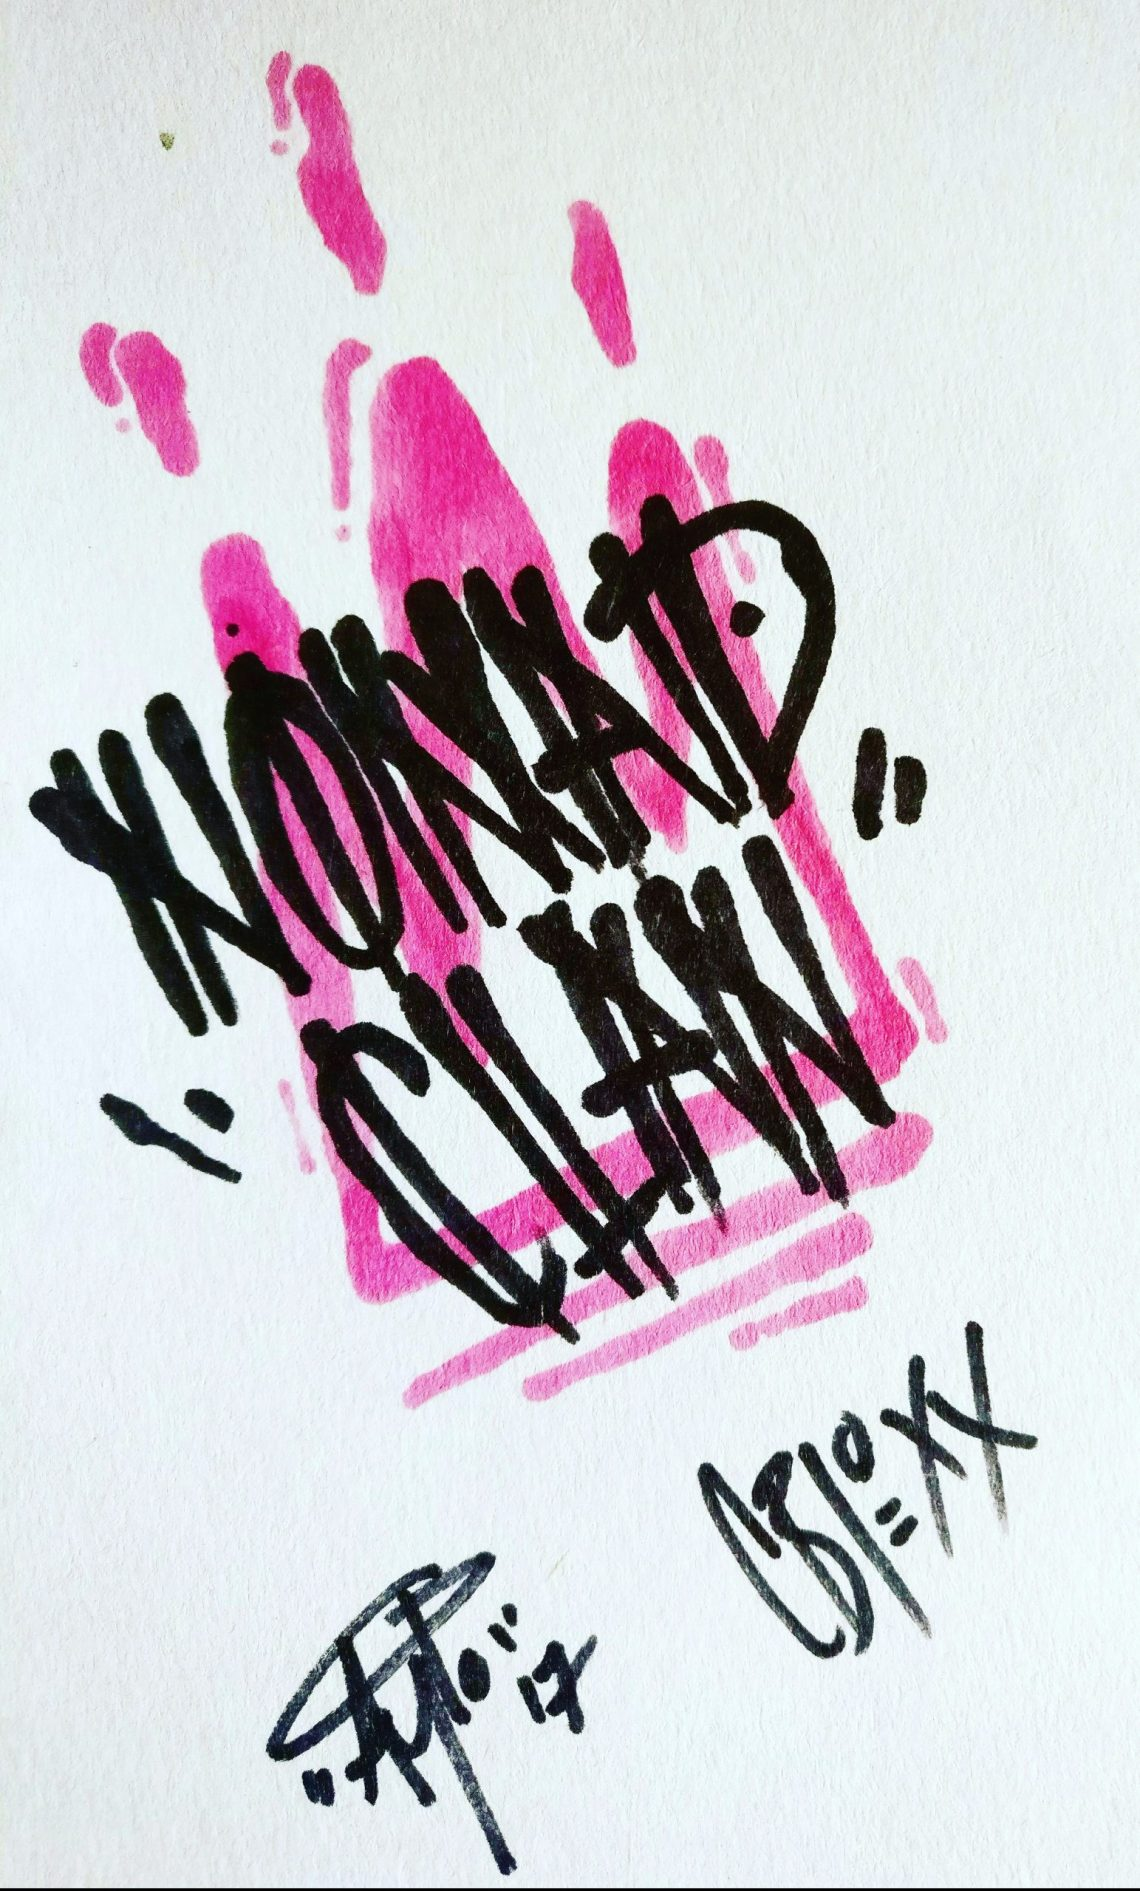 Nomad Clan Black Book Tag